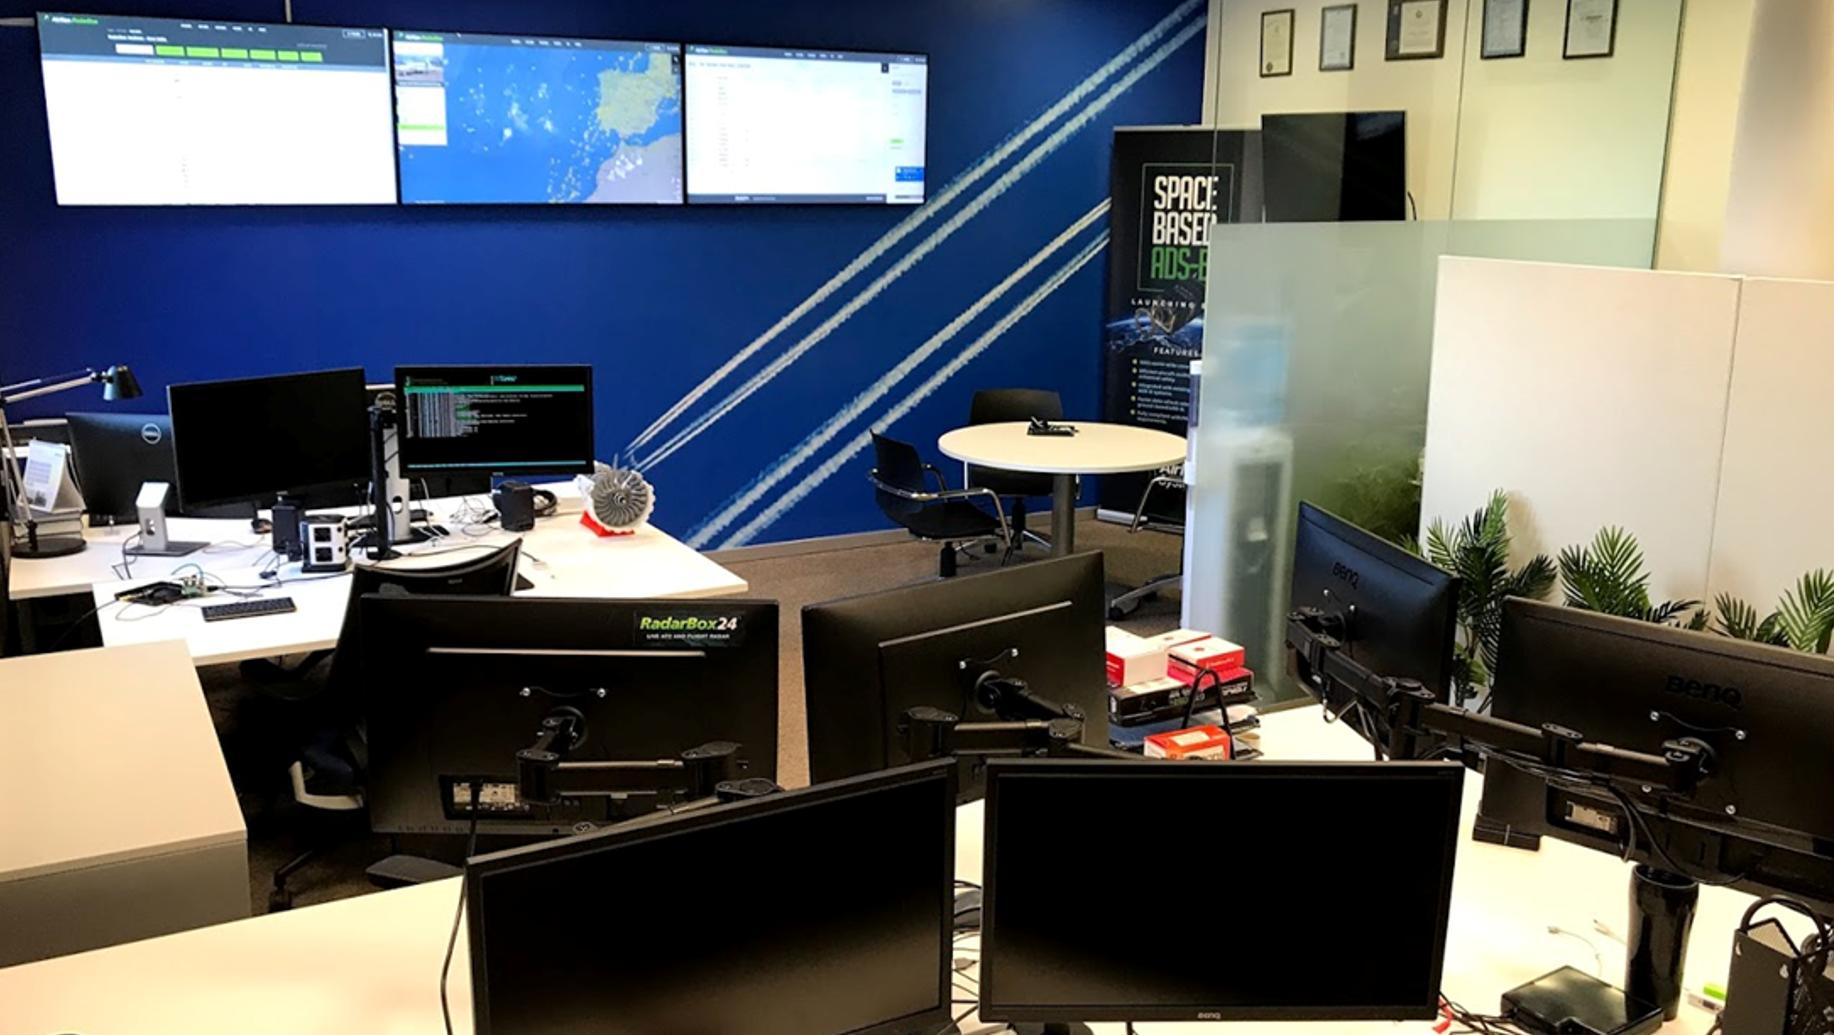 About RadarBox - AirNav RadarBox - Live Flight Tracker and Airport